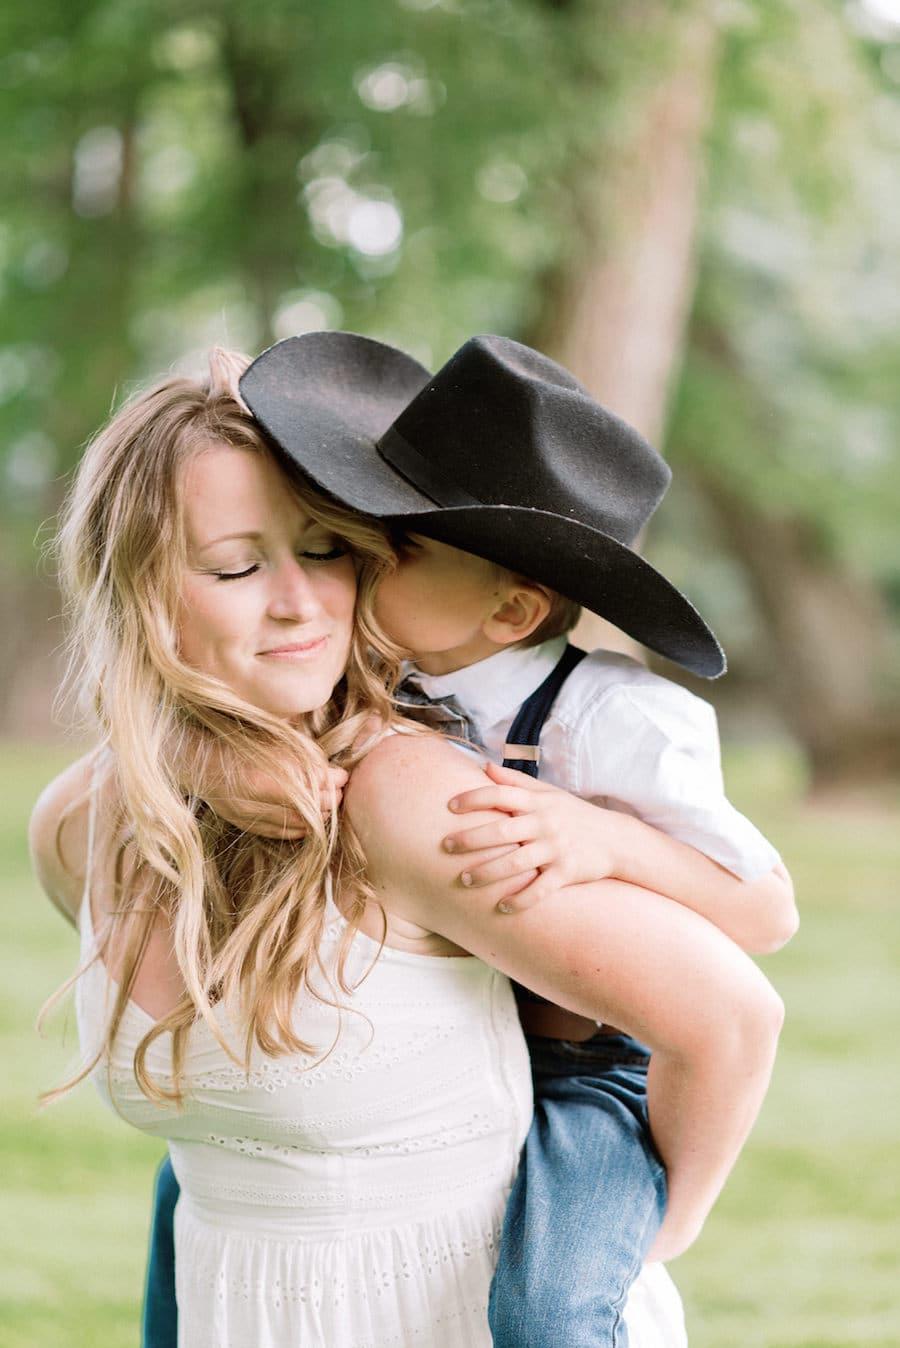 Little boy kissing momma on the cheek